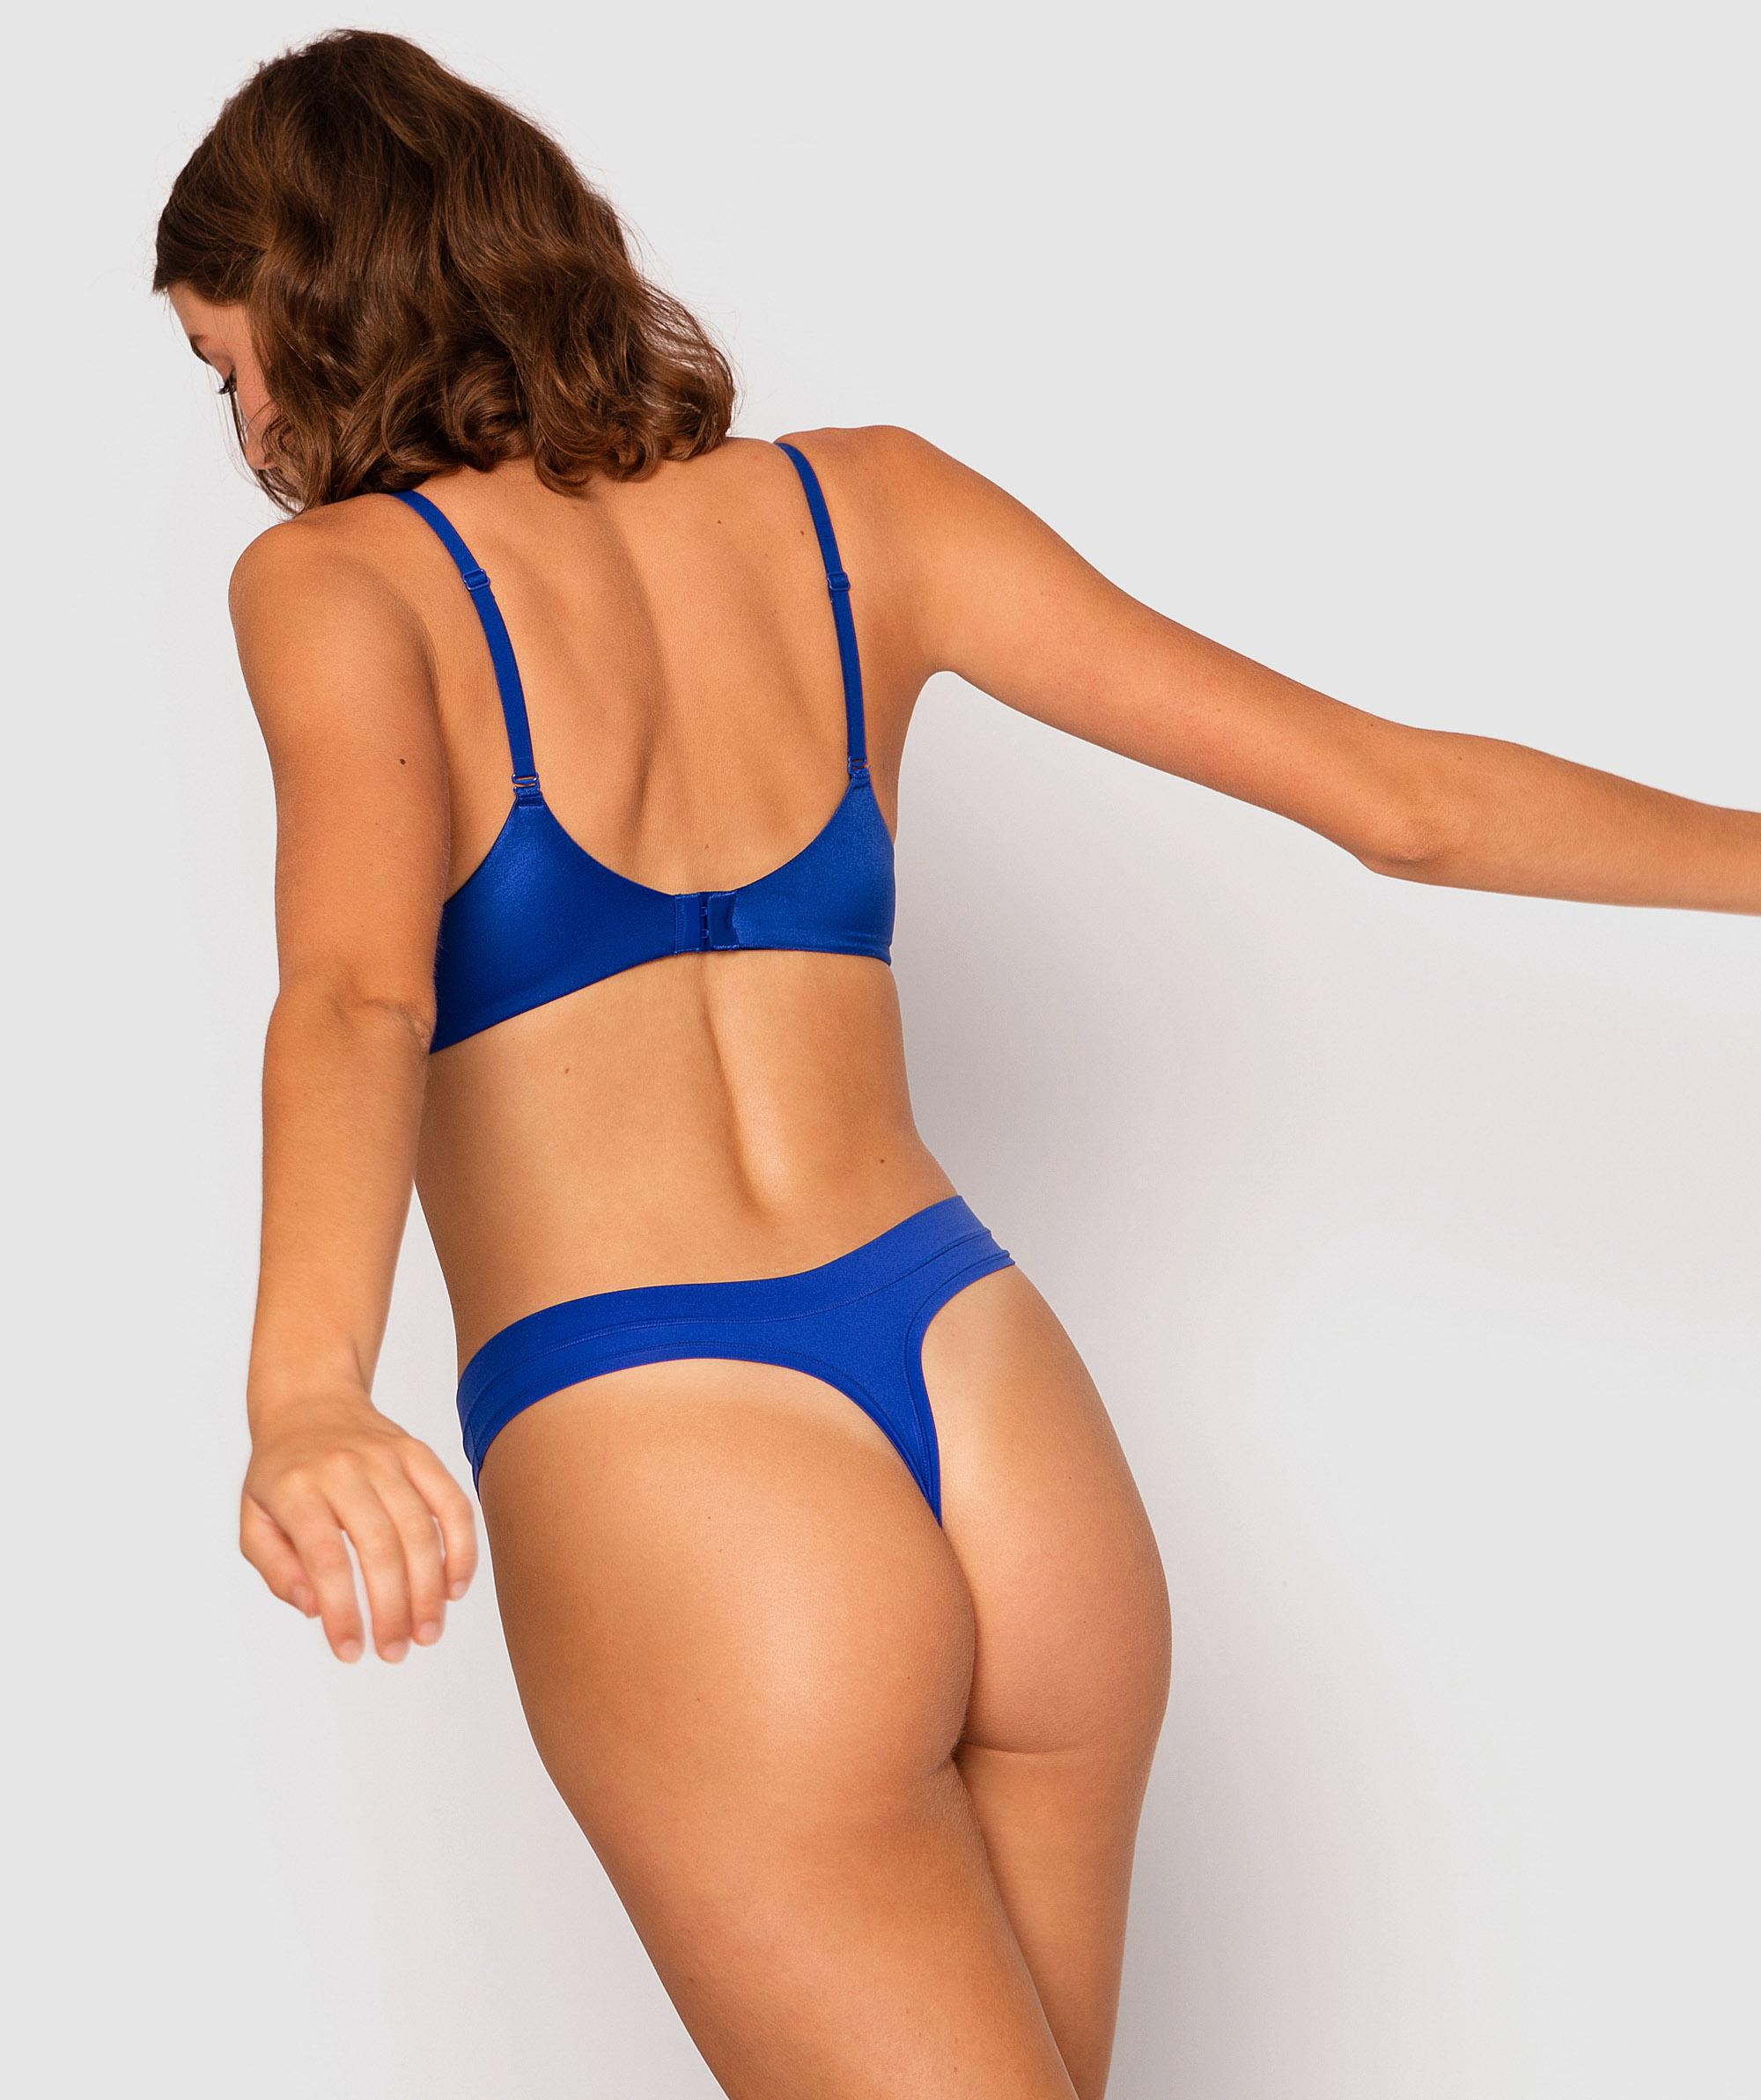 Body Bliss 2nd Gen V-String Knicker - Dark Blue